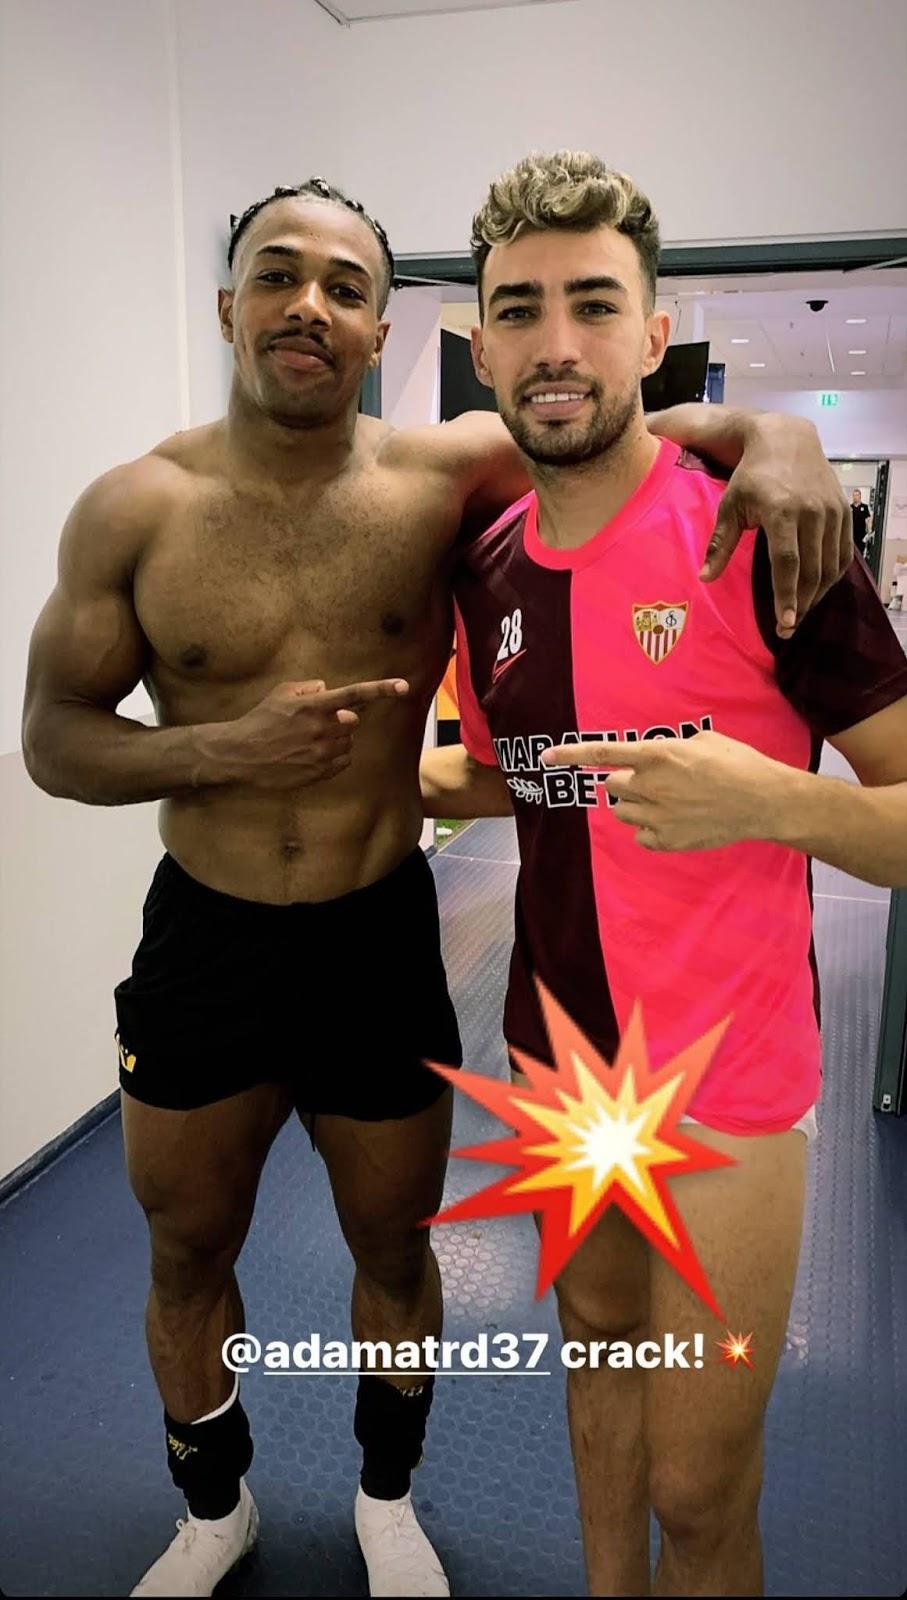 footballers in underwear